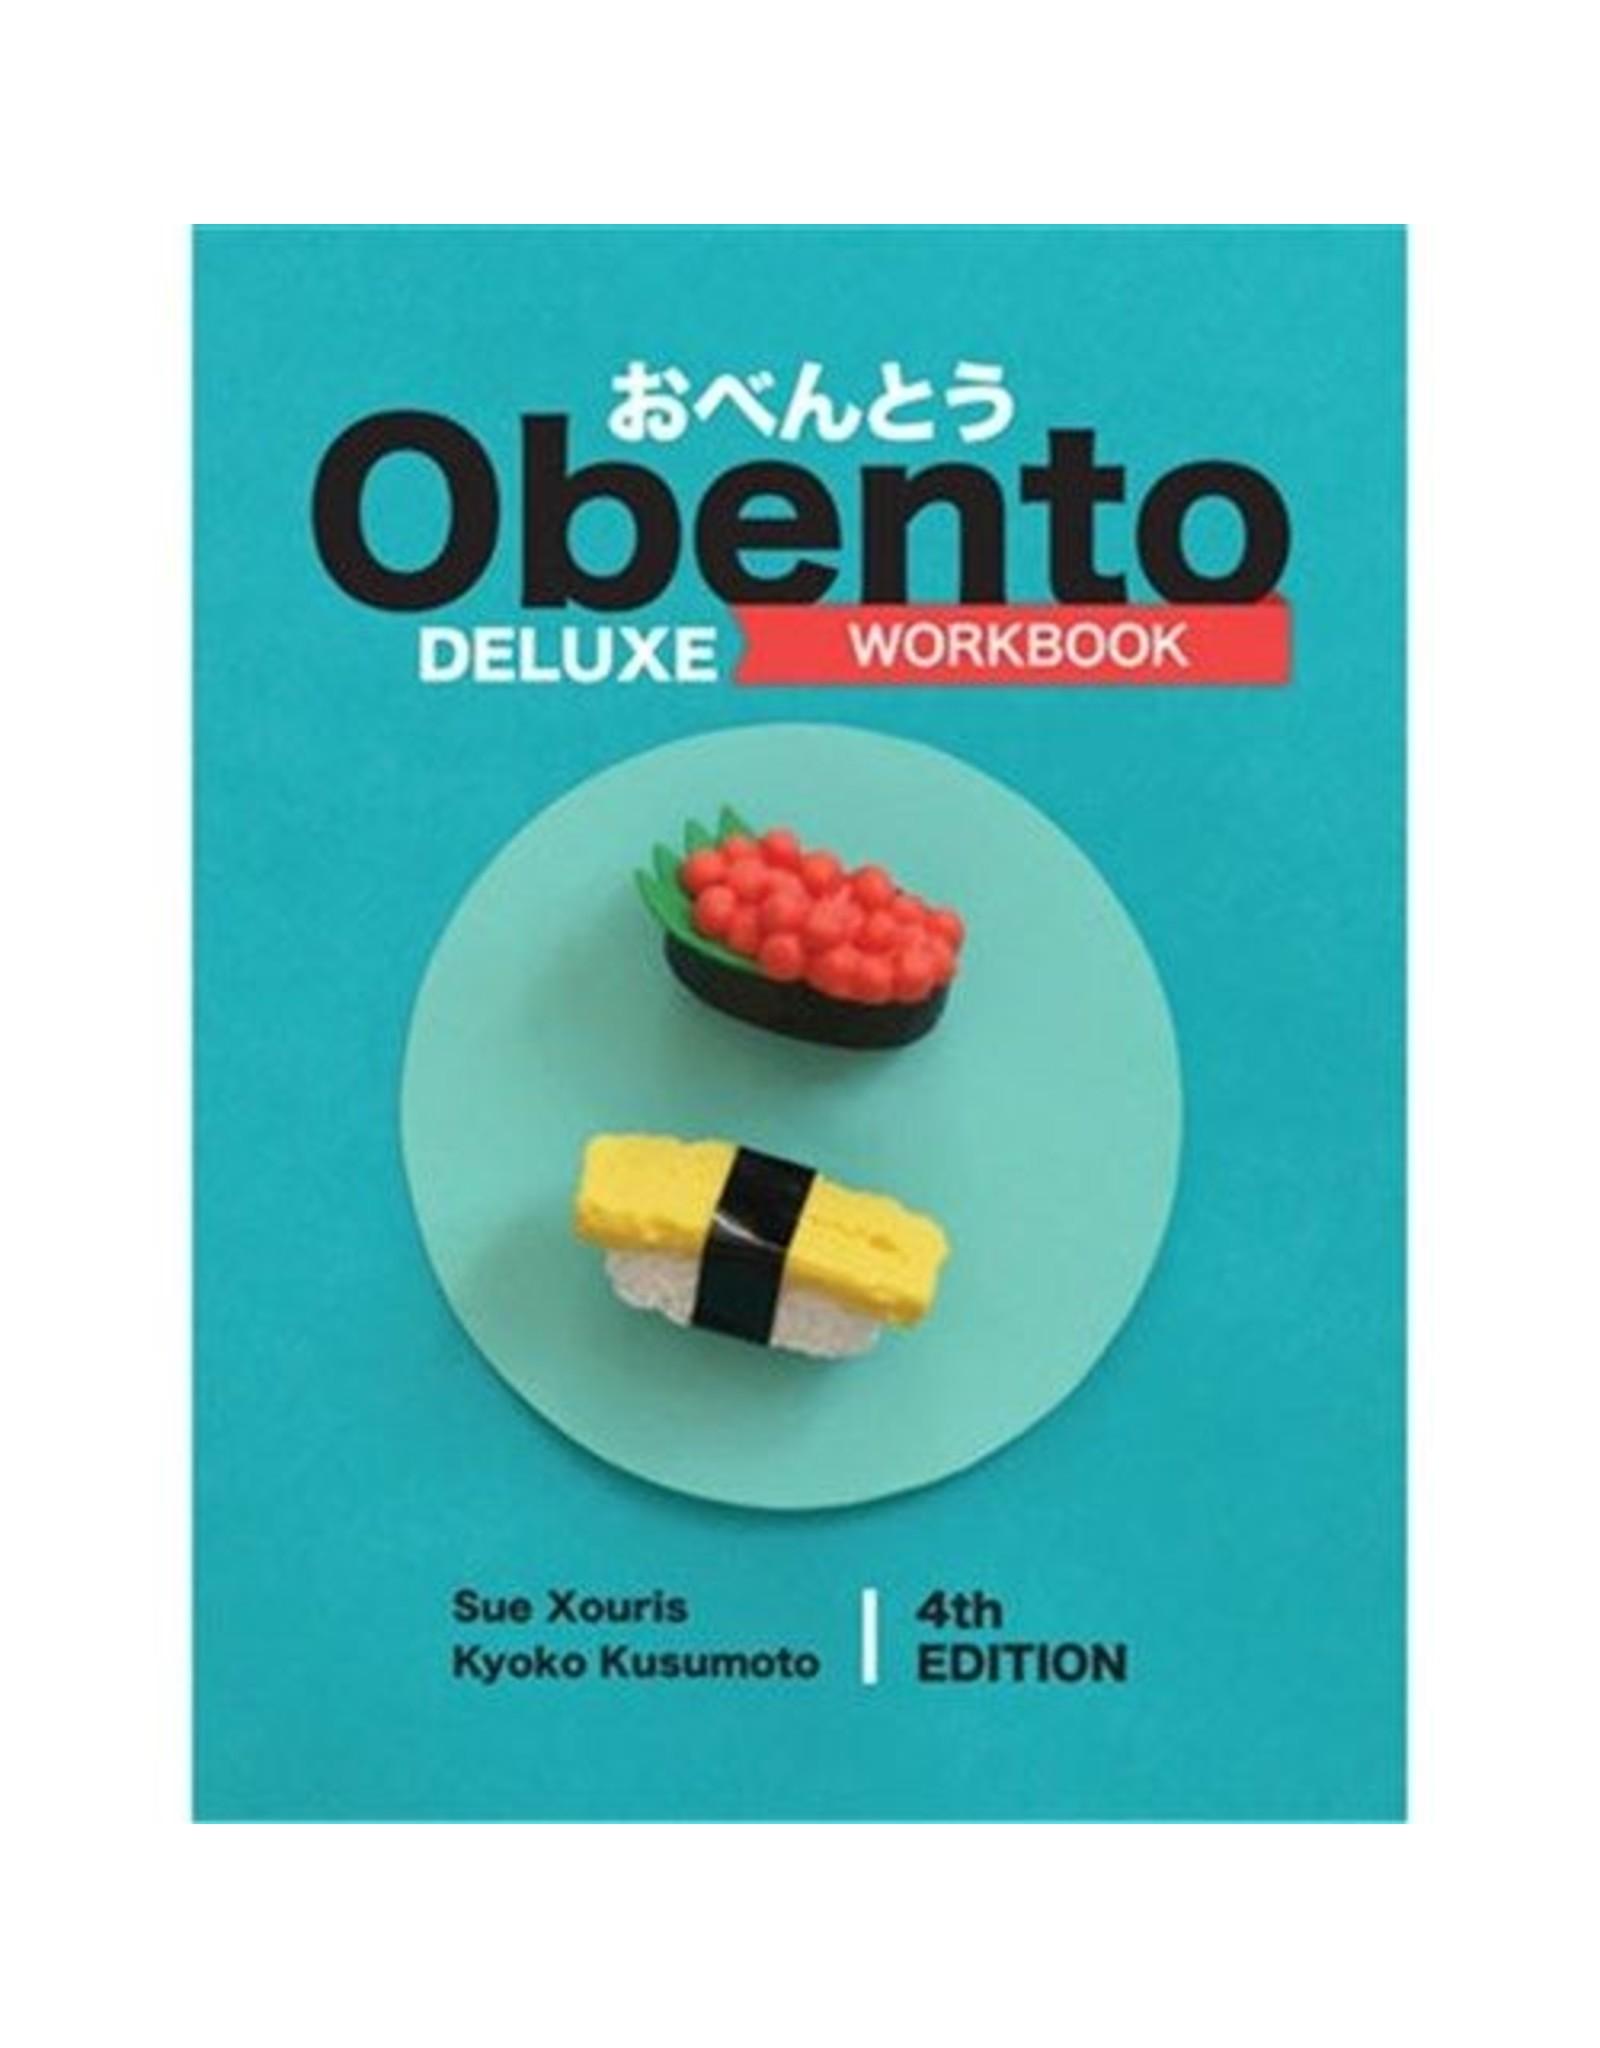 [NEW EDITION] OBENTO (DELUXE) WORKBOOK